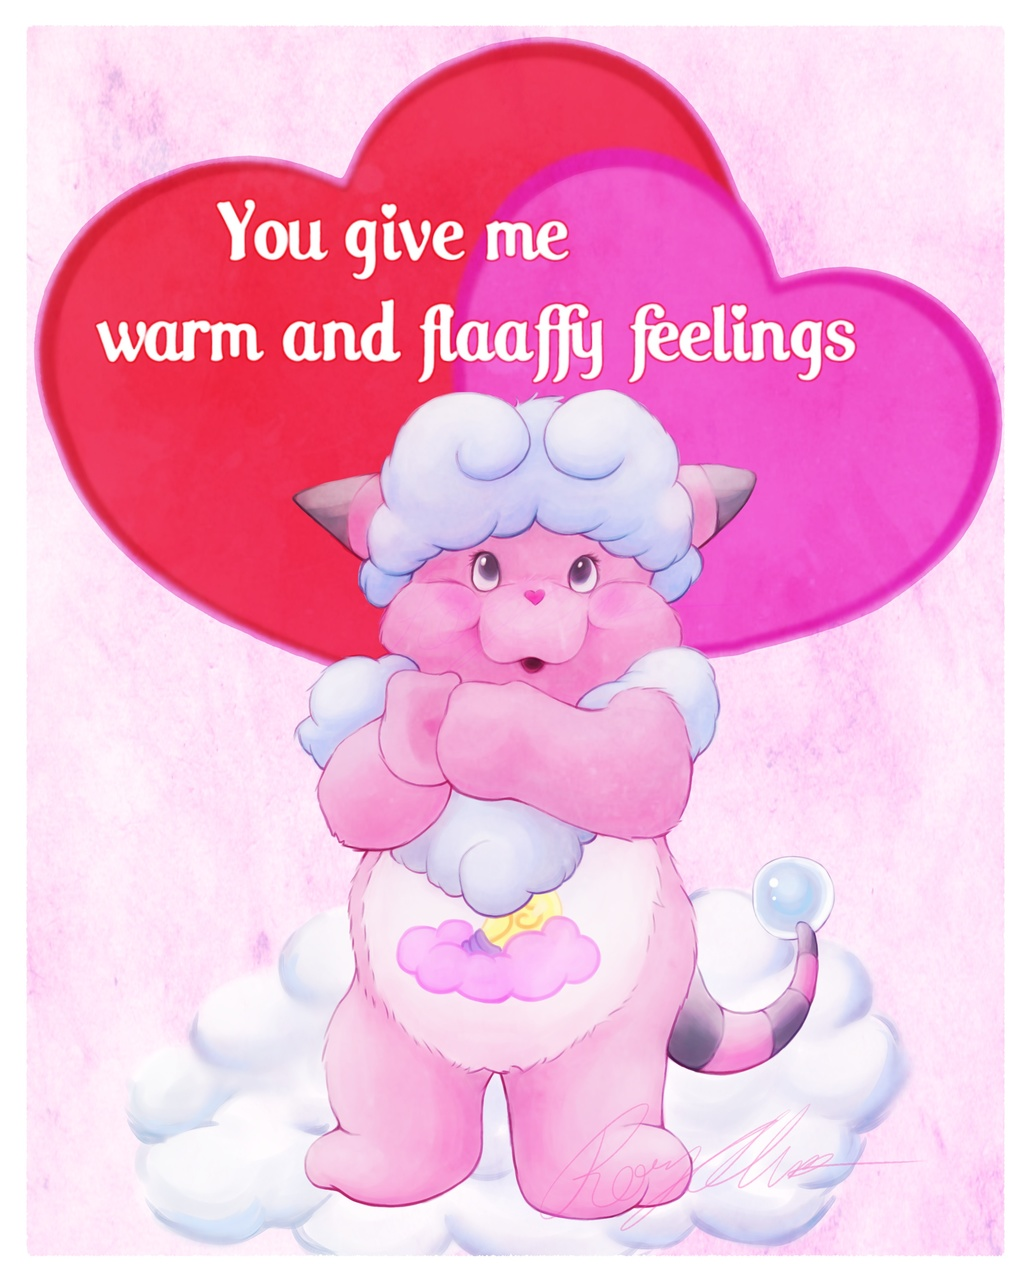 Flaaffy Feelings Pokarebear card